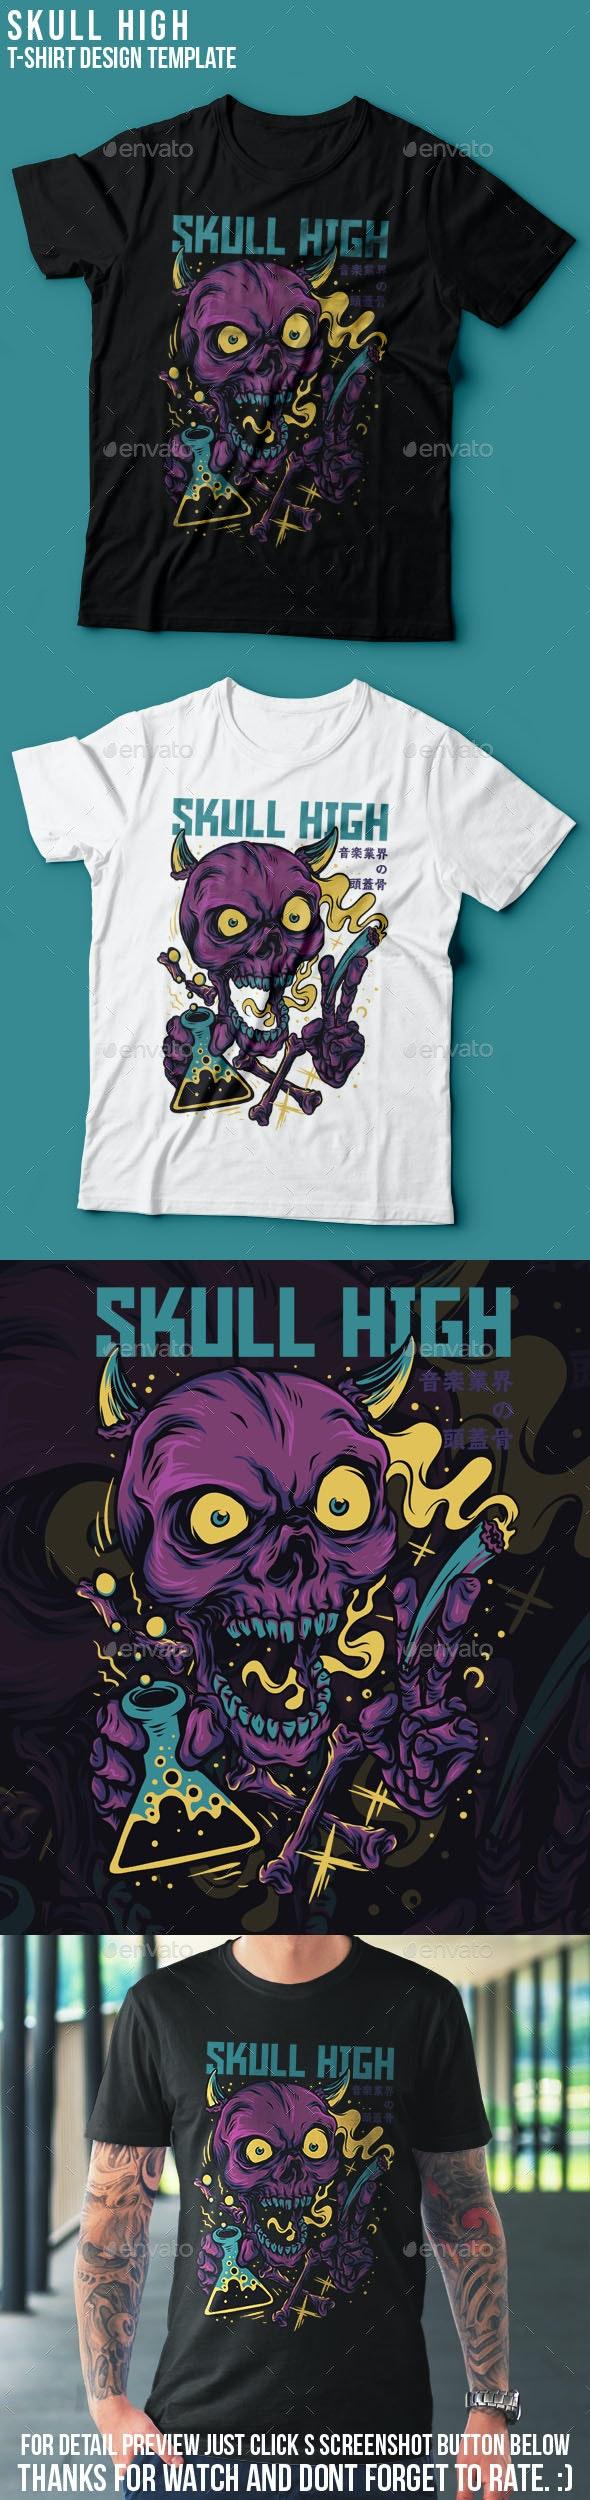 Skull High T-Shirt Design - Grunge Designs